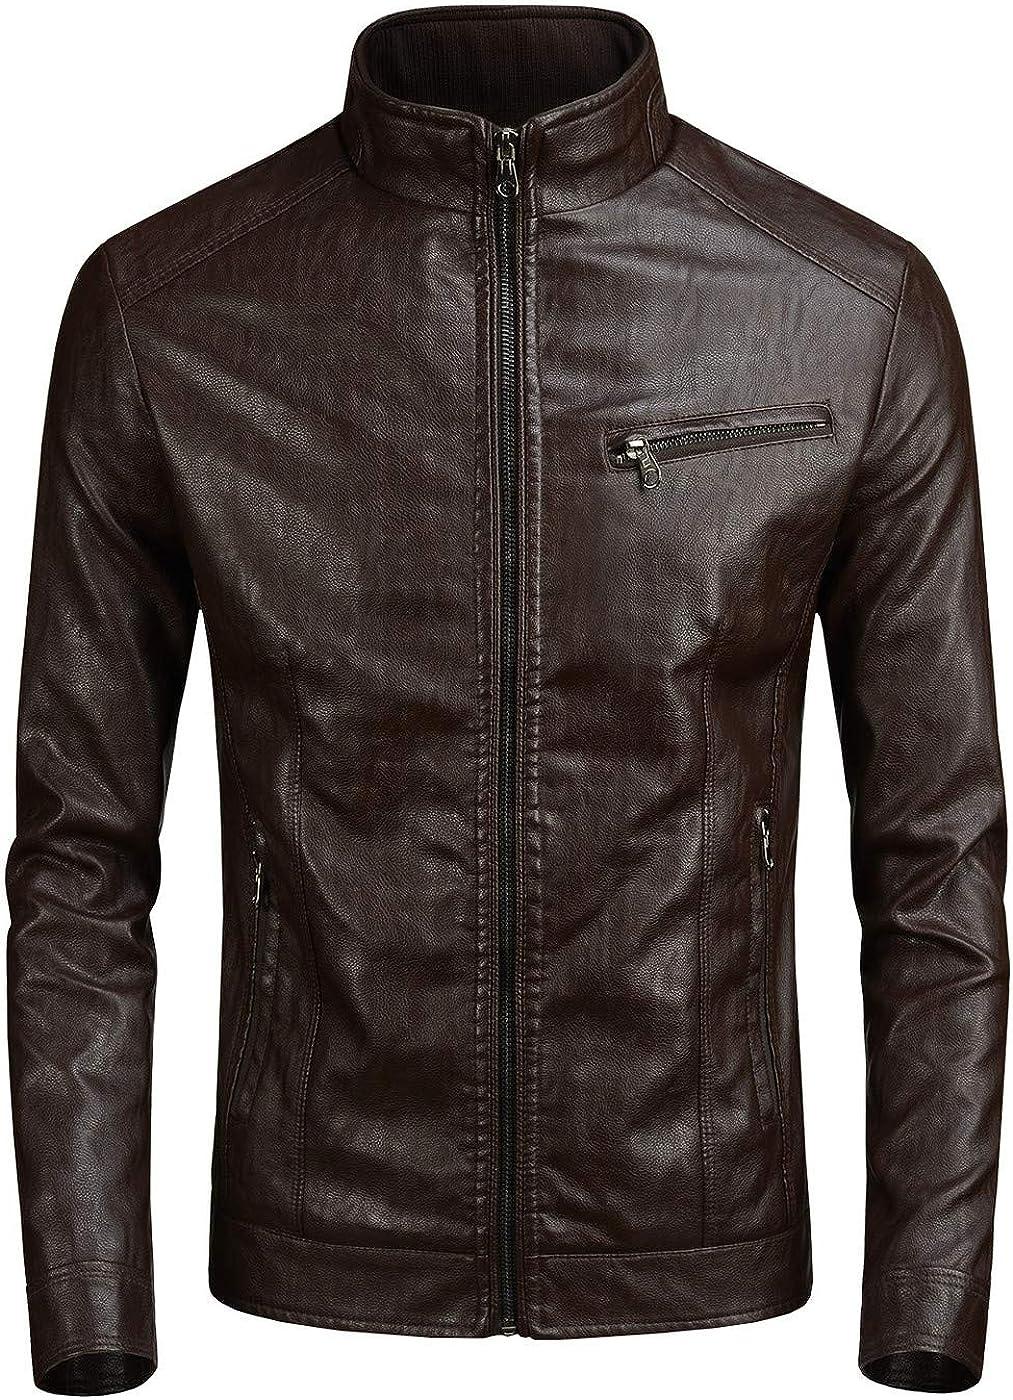 JUREX Men's Vintage New product type Leather Easy-to-use Moto Biker Black Jacket